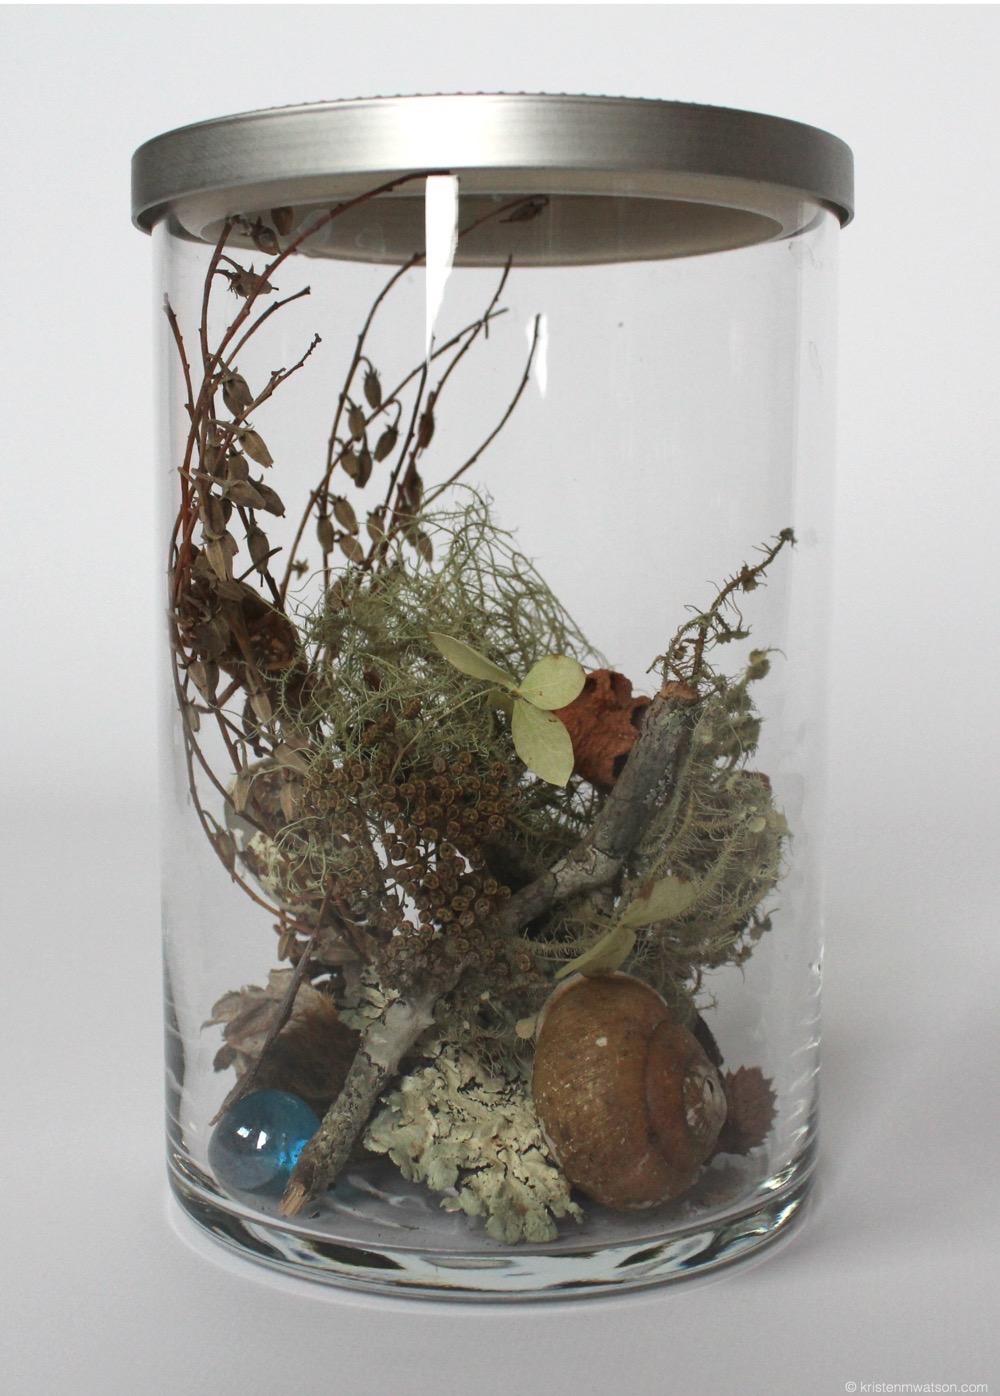 Reliquary_Found organics (South Carolina)_3x7in._©2015 Kristen M. Watson Art Studio, LLC_1 2.jpg